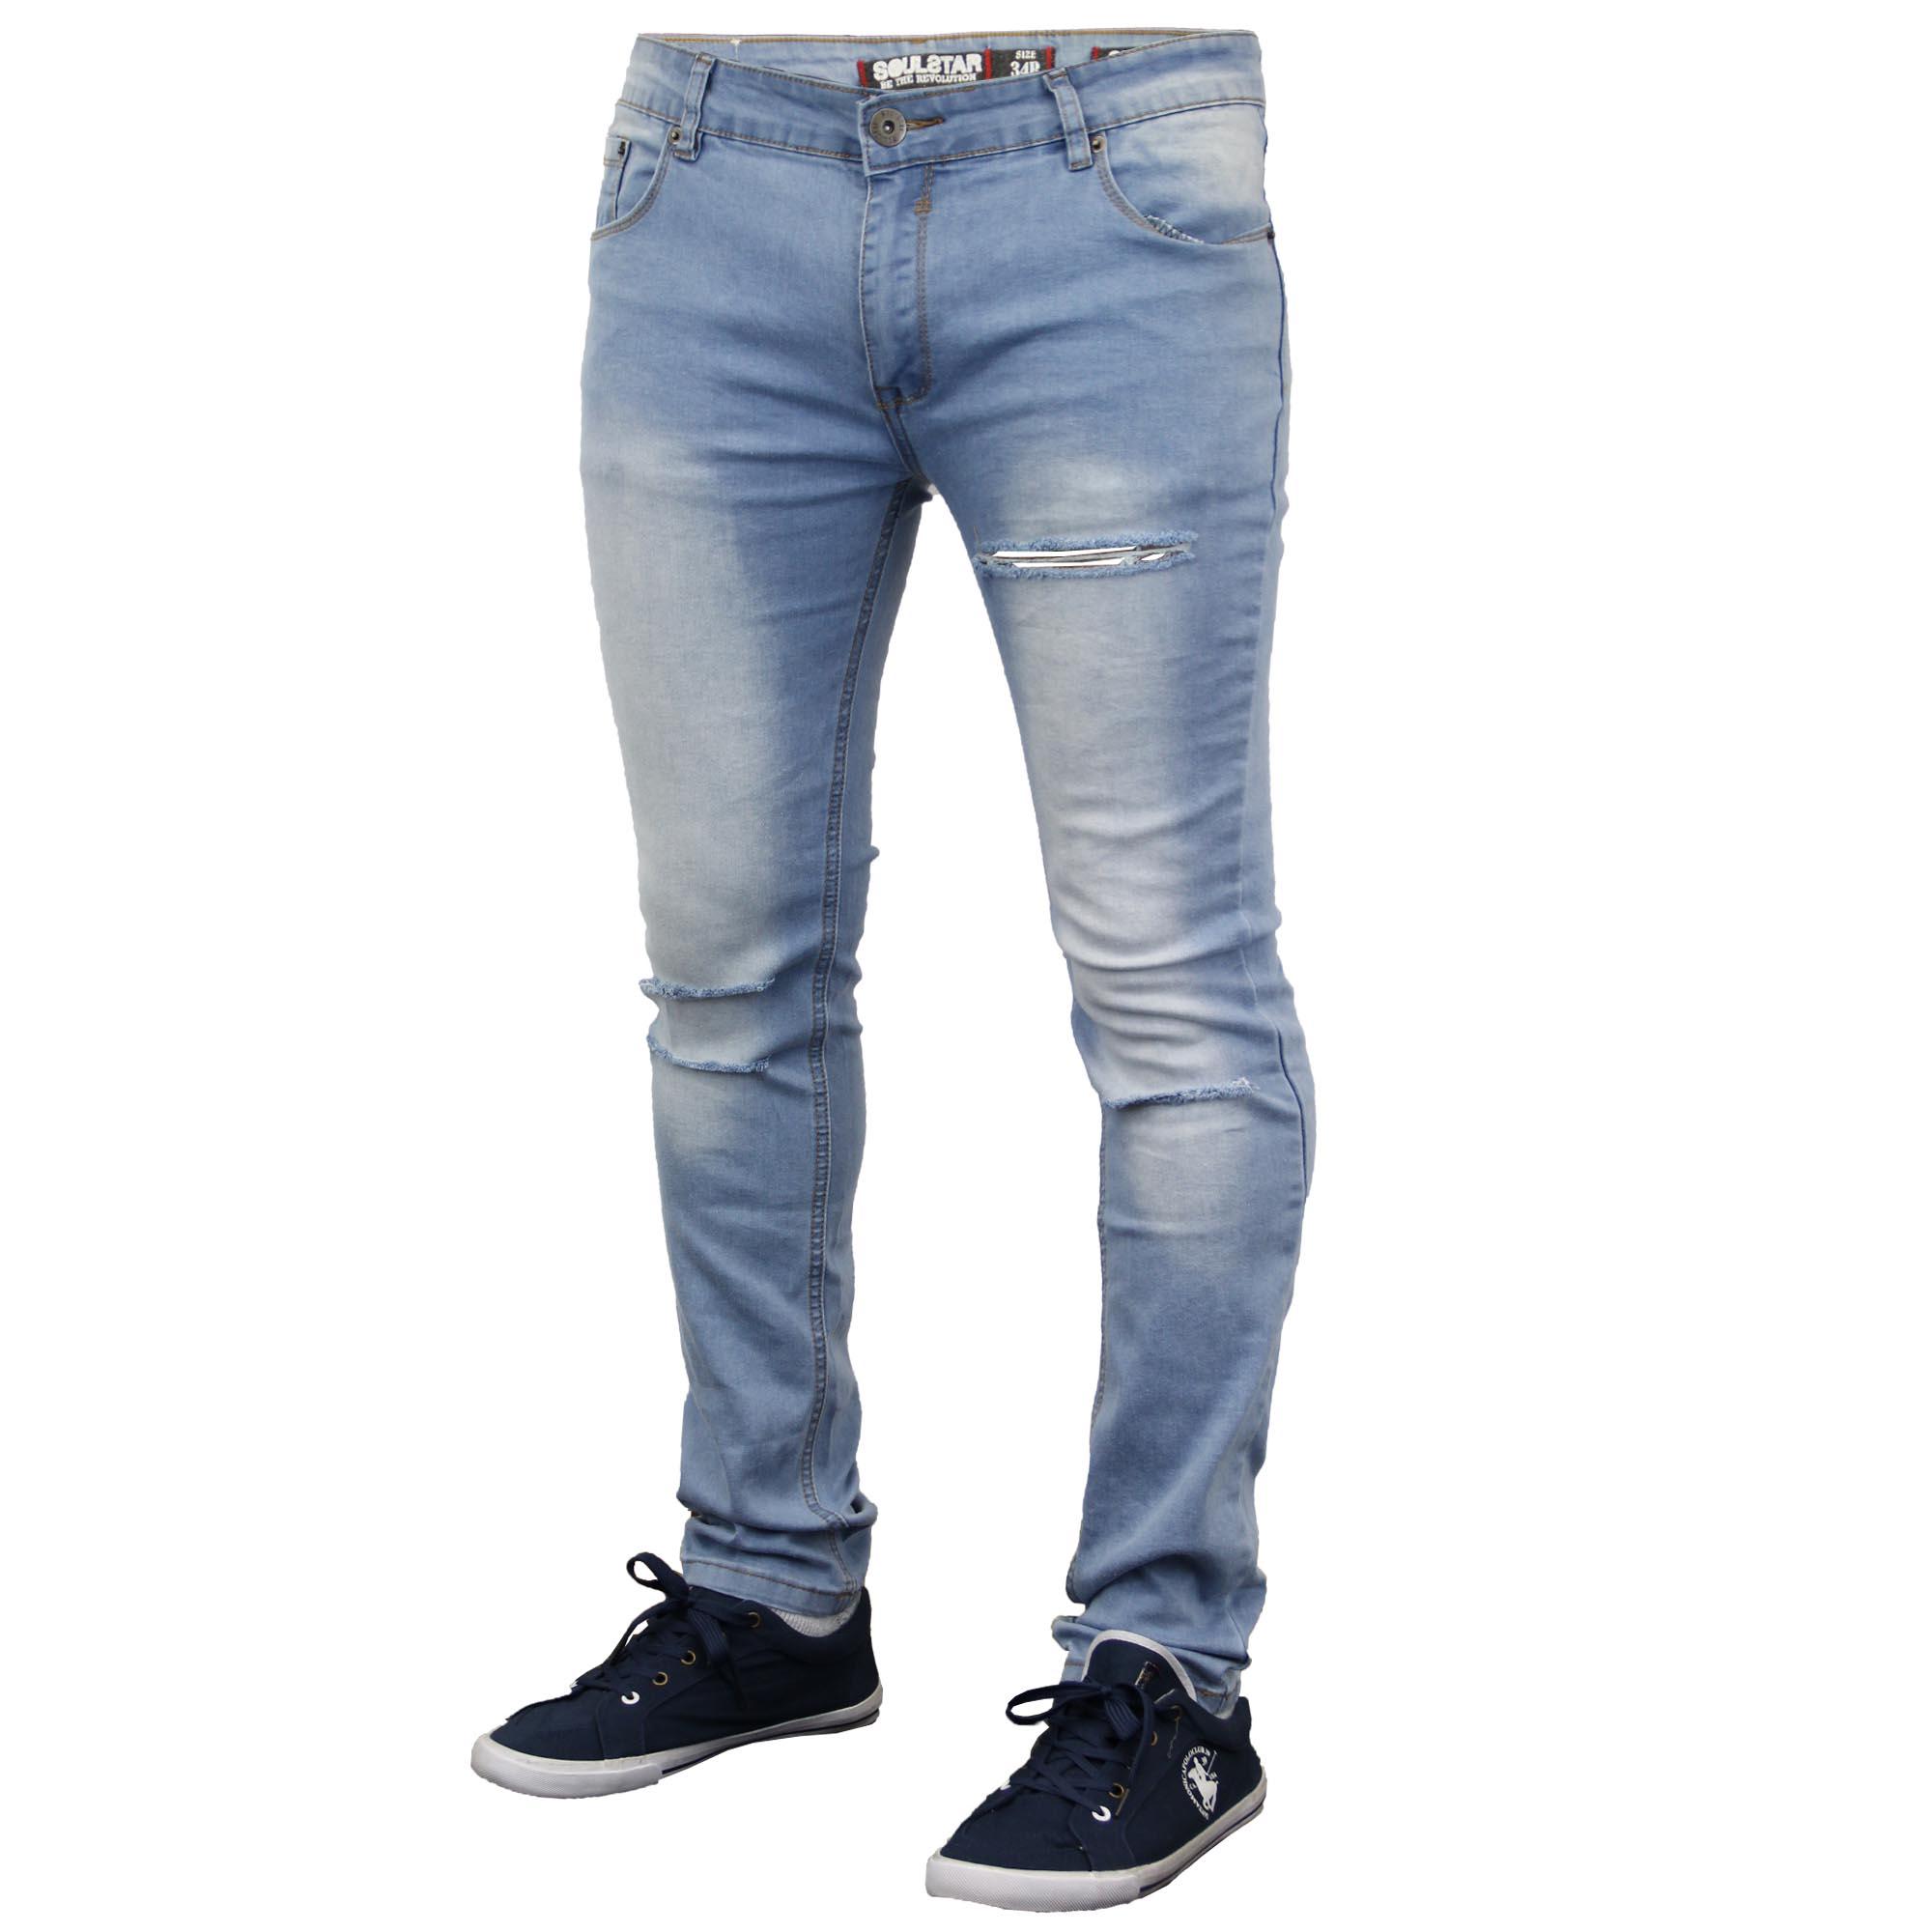 herren zerrissen denim skinny fit jeans von soul star ebay. Black Bedroom Furniture Sets. Home Design Ideas